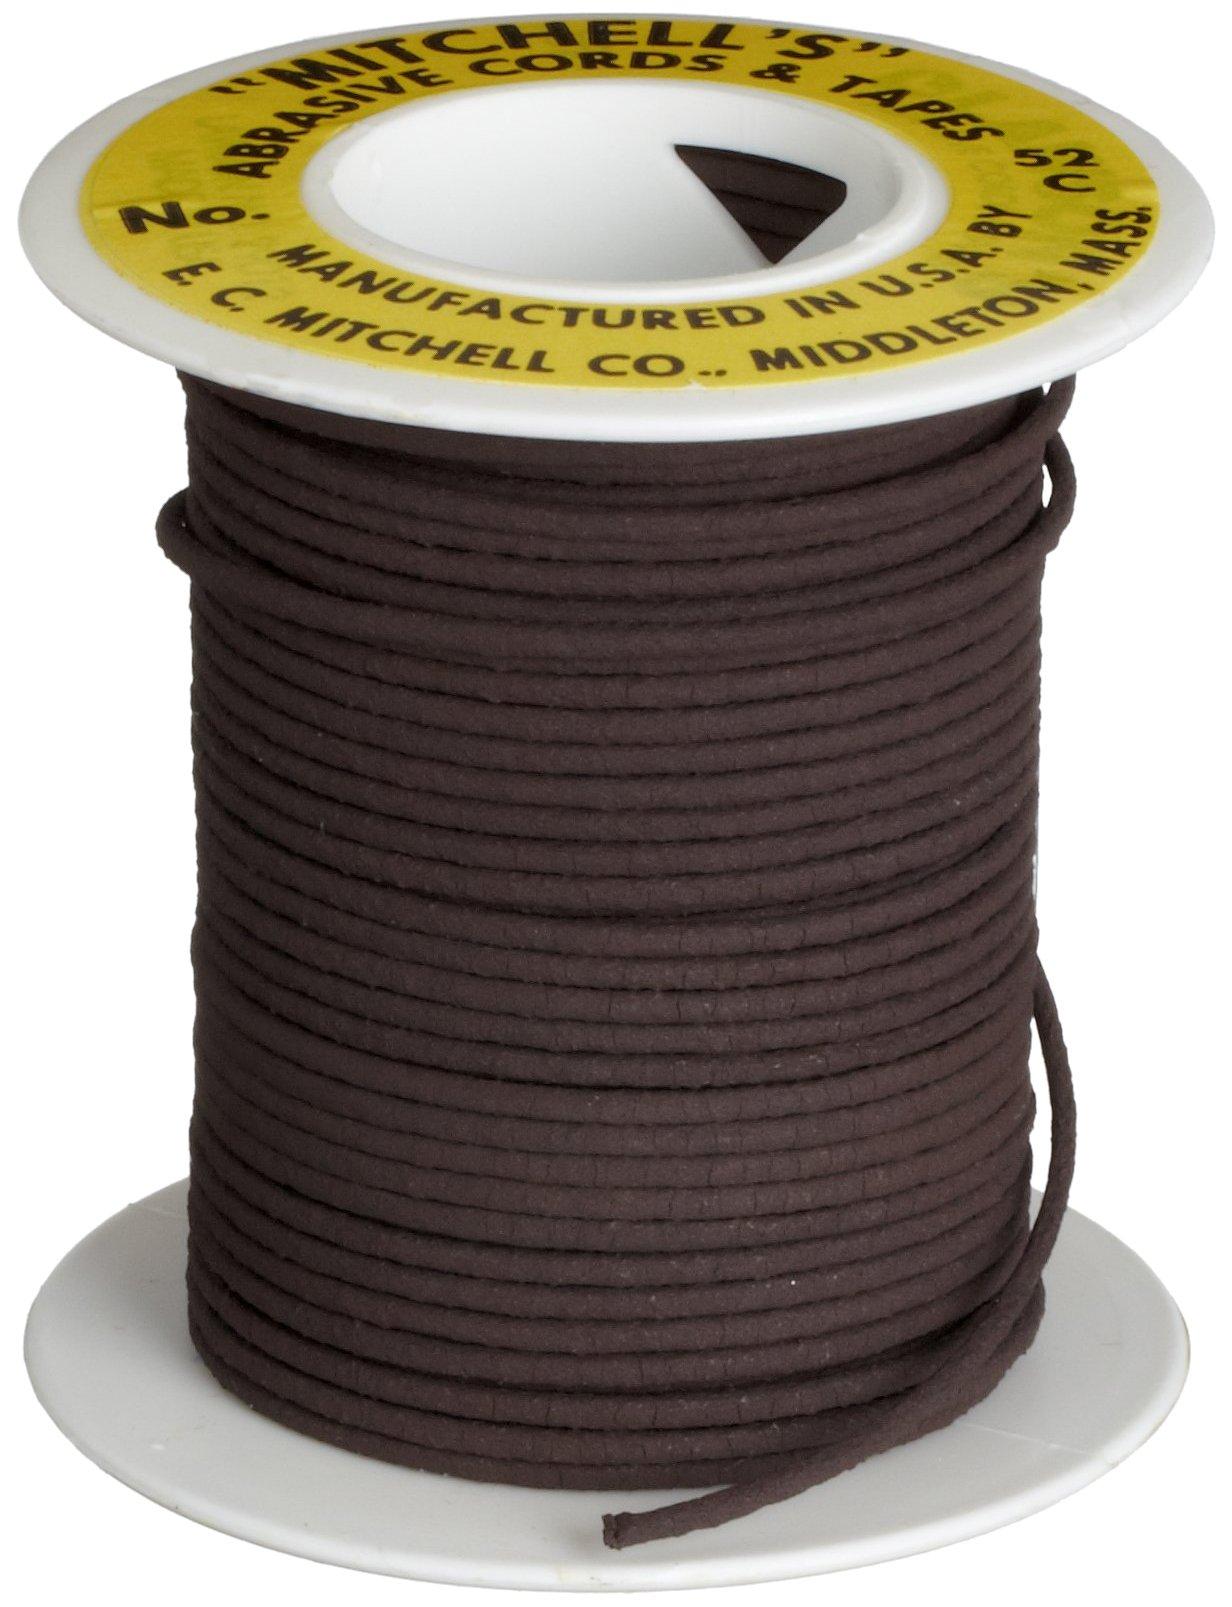 Mitchell Abrasives 52-C Round Crocus Polishing Cord, .055'' Diameter x 25 Feet by Mitchell Abrasives